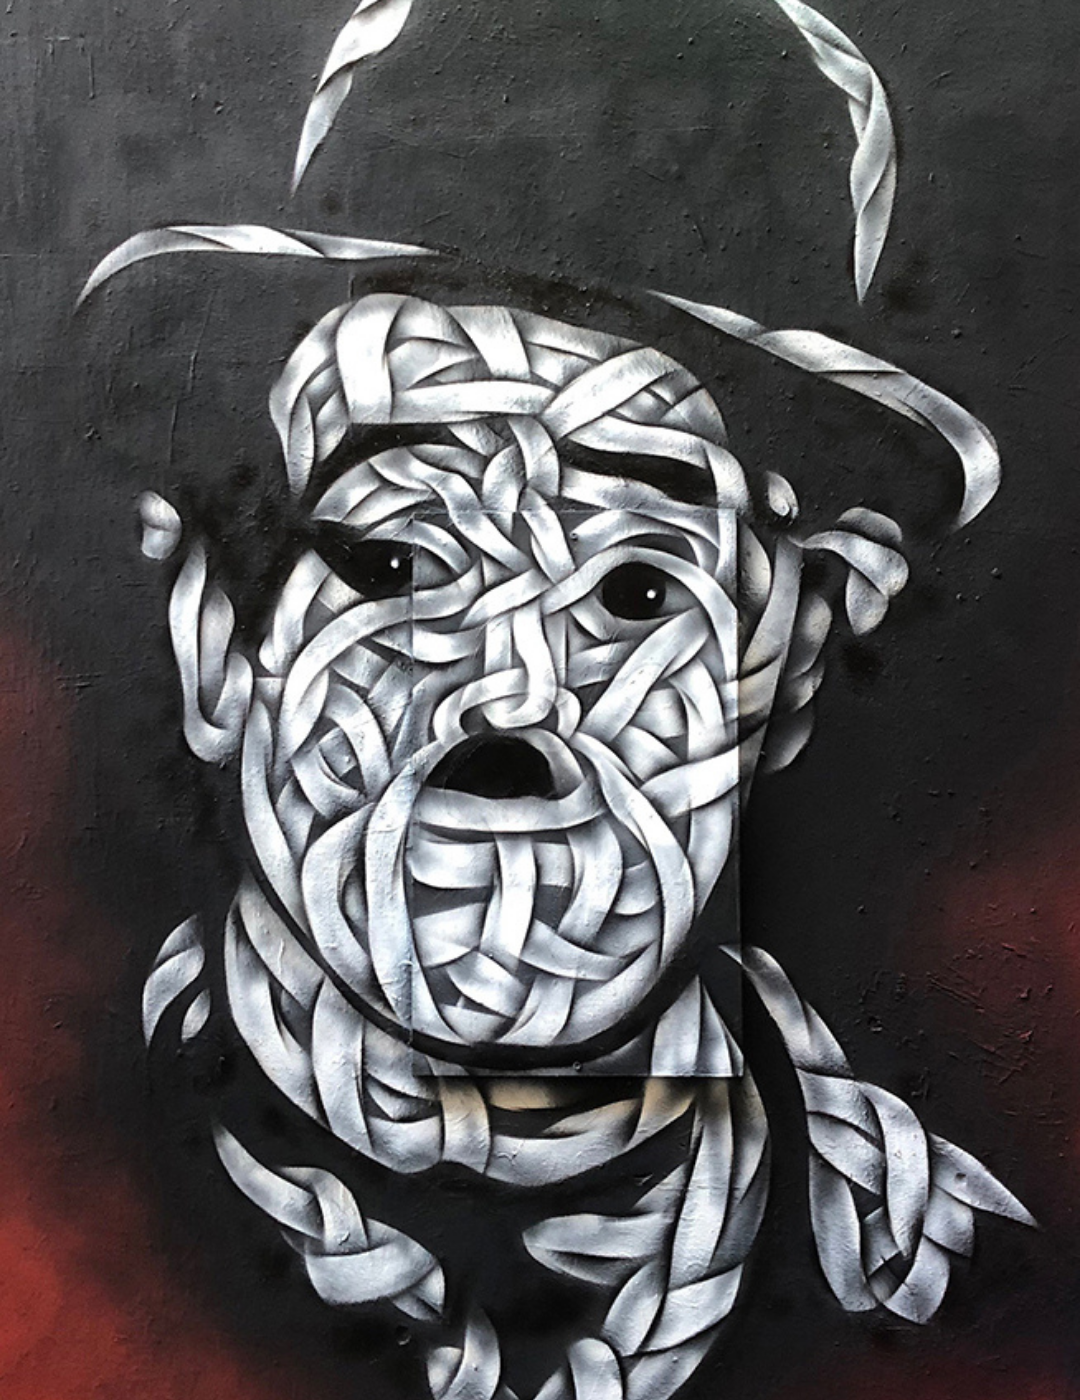 Charlie Chaplin Street Art by Otto Schade @ Kino Café, Haus Schwarzenberg, Mitte (Berlin)